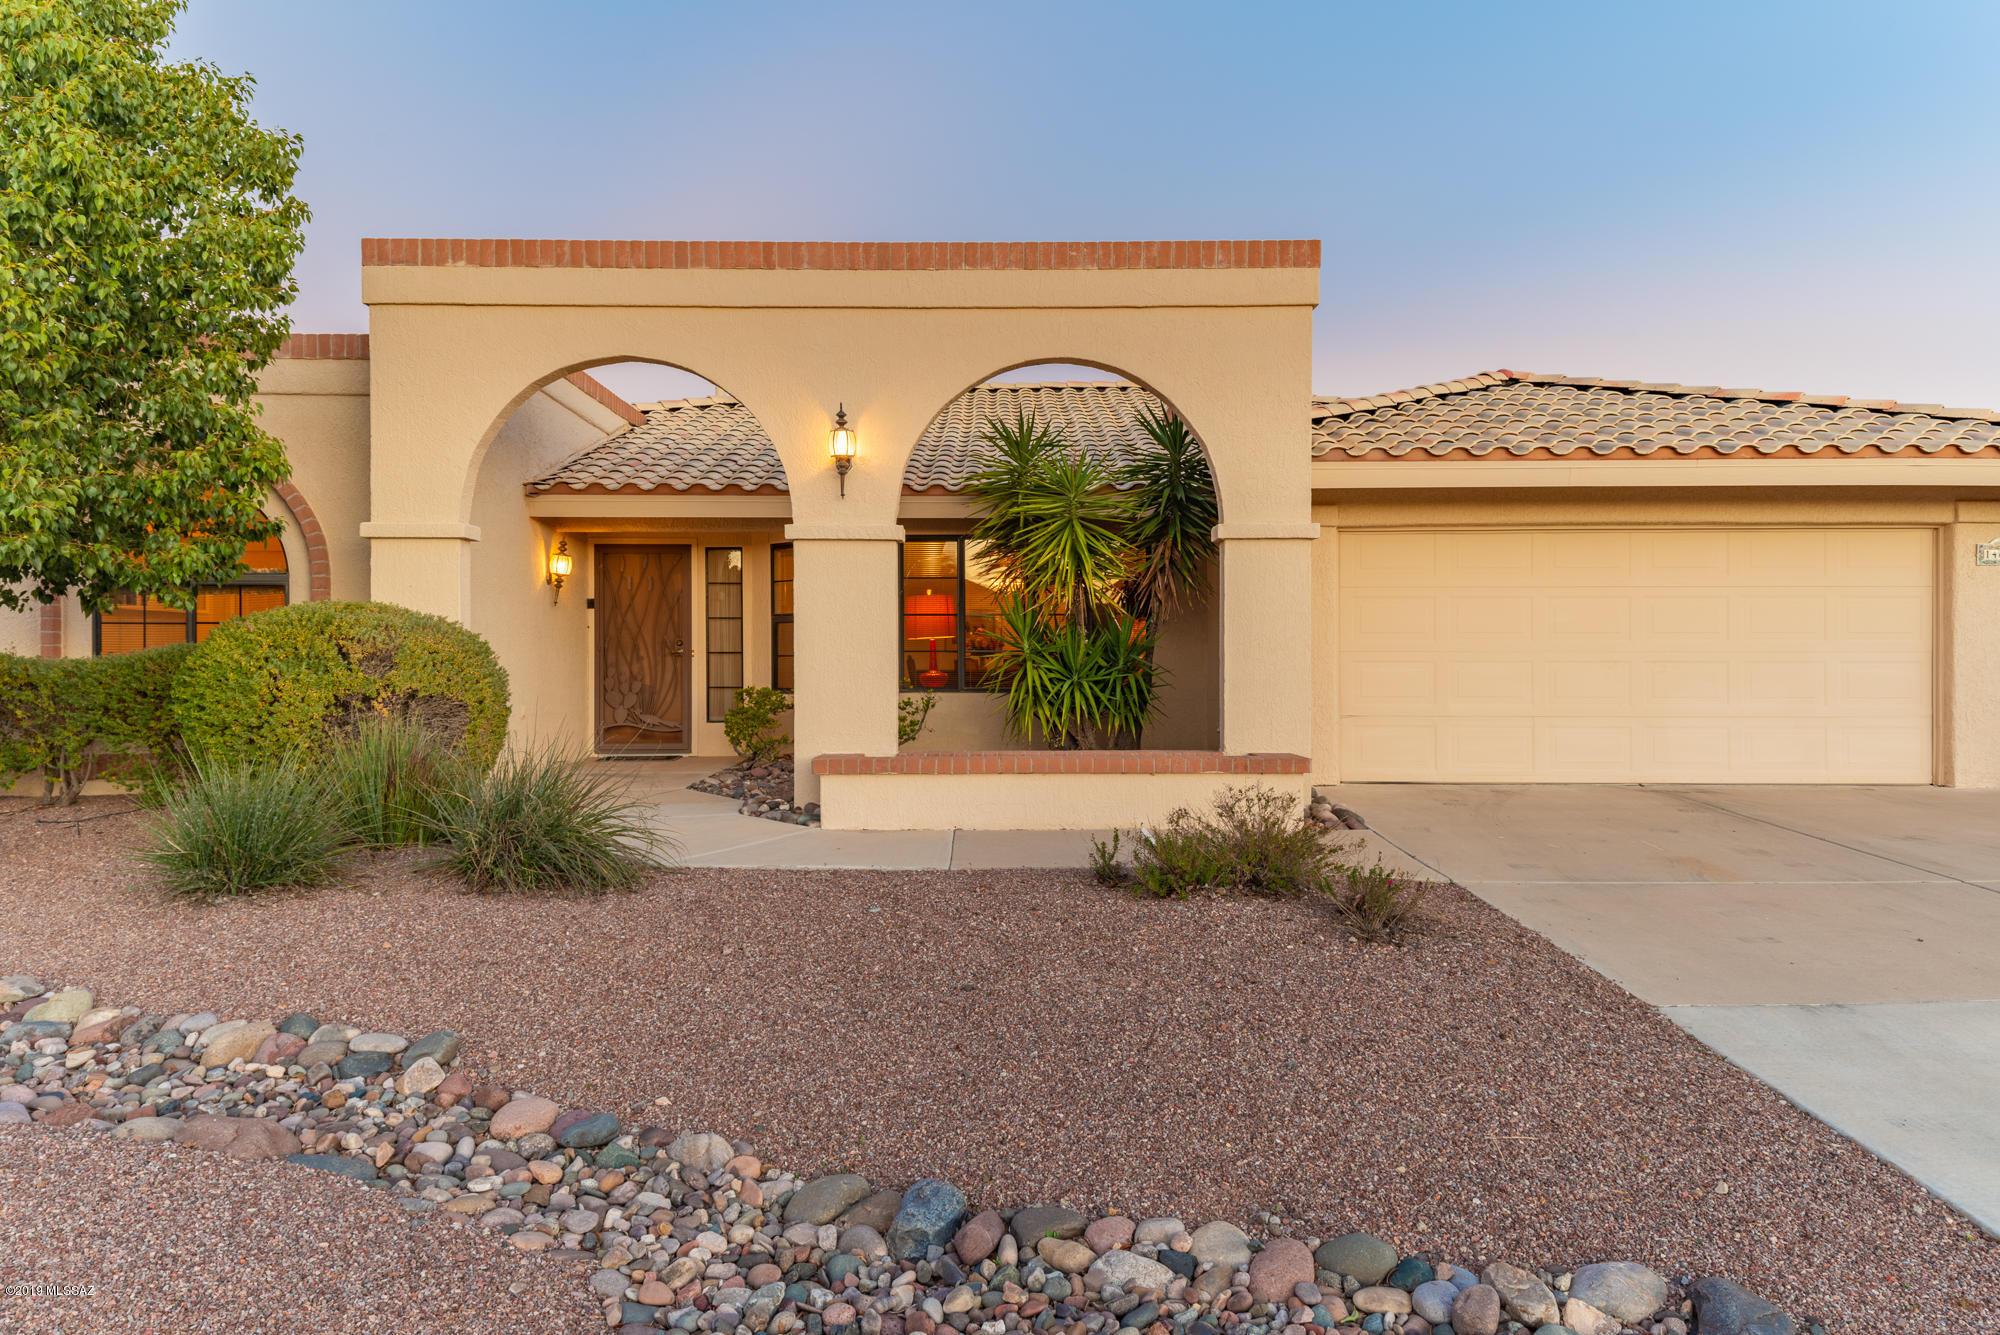 14670 N Wonderview Drive, Oro Valley, Arizona 85755, 2 Bedrooms Bedrooms, ,2 BathroomsBathrooms,Rental,For Rent,14670 N Wonderview Drive,22019298